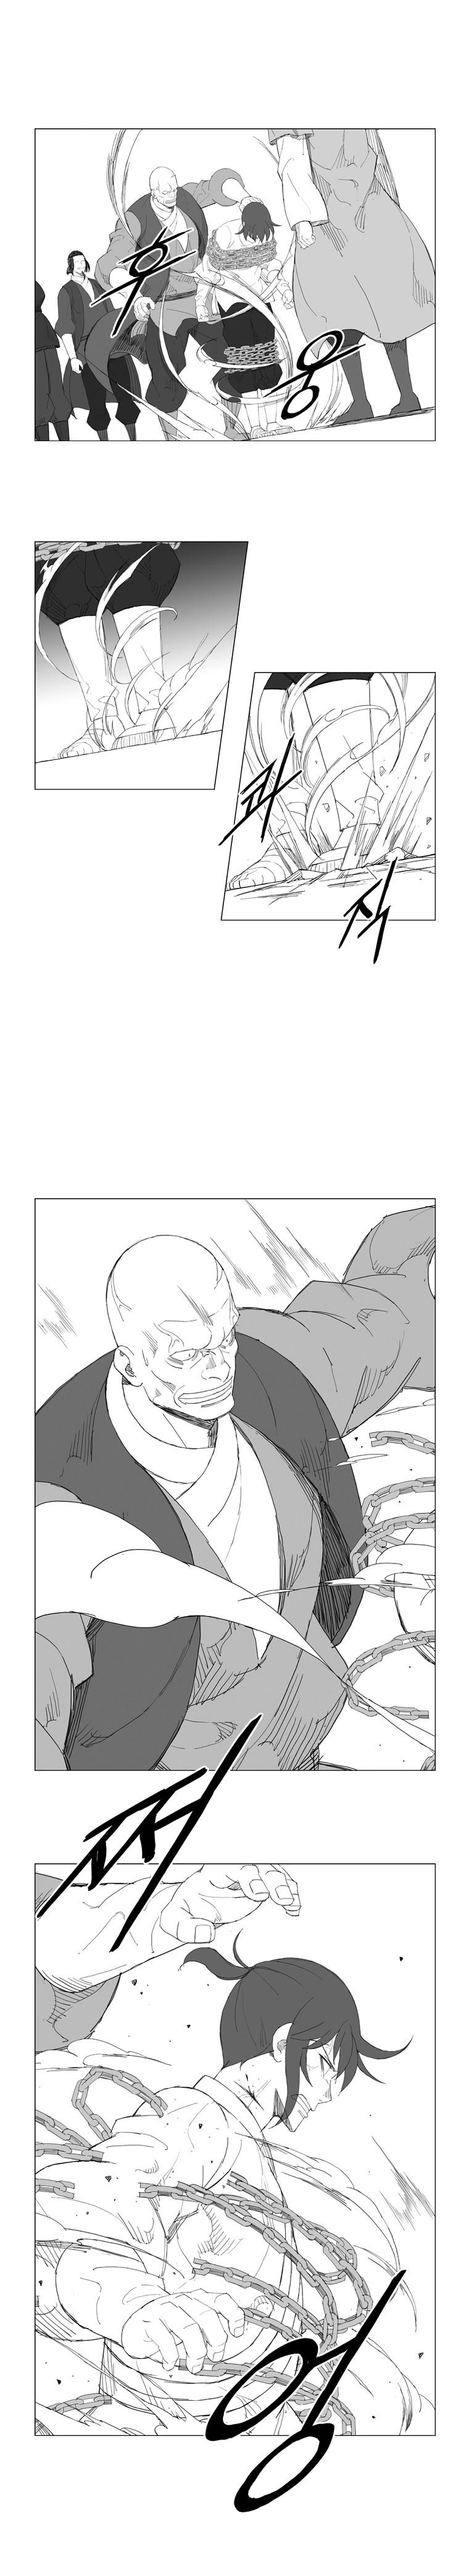 https://r1.ninemanga.com/comics/pic2/39/28263/411639/1523649905469.jpg Page 2